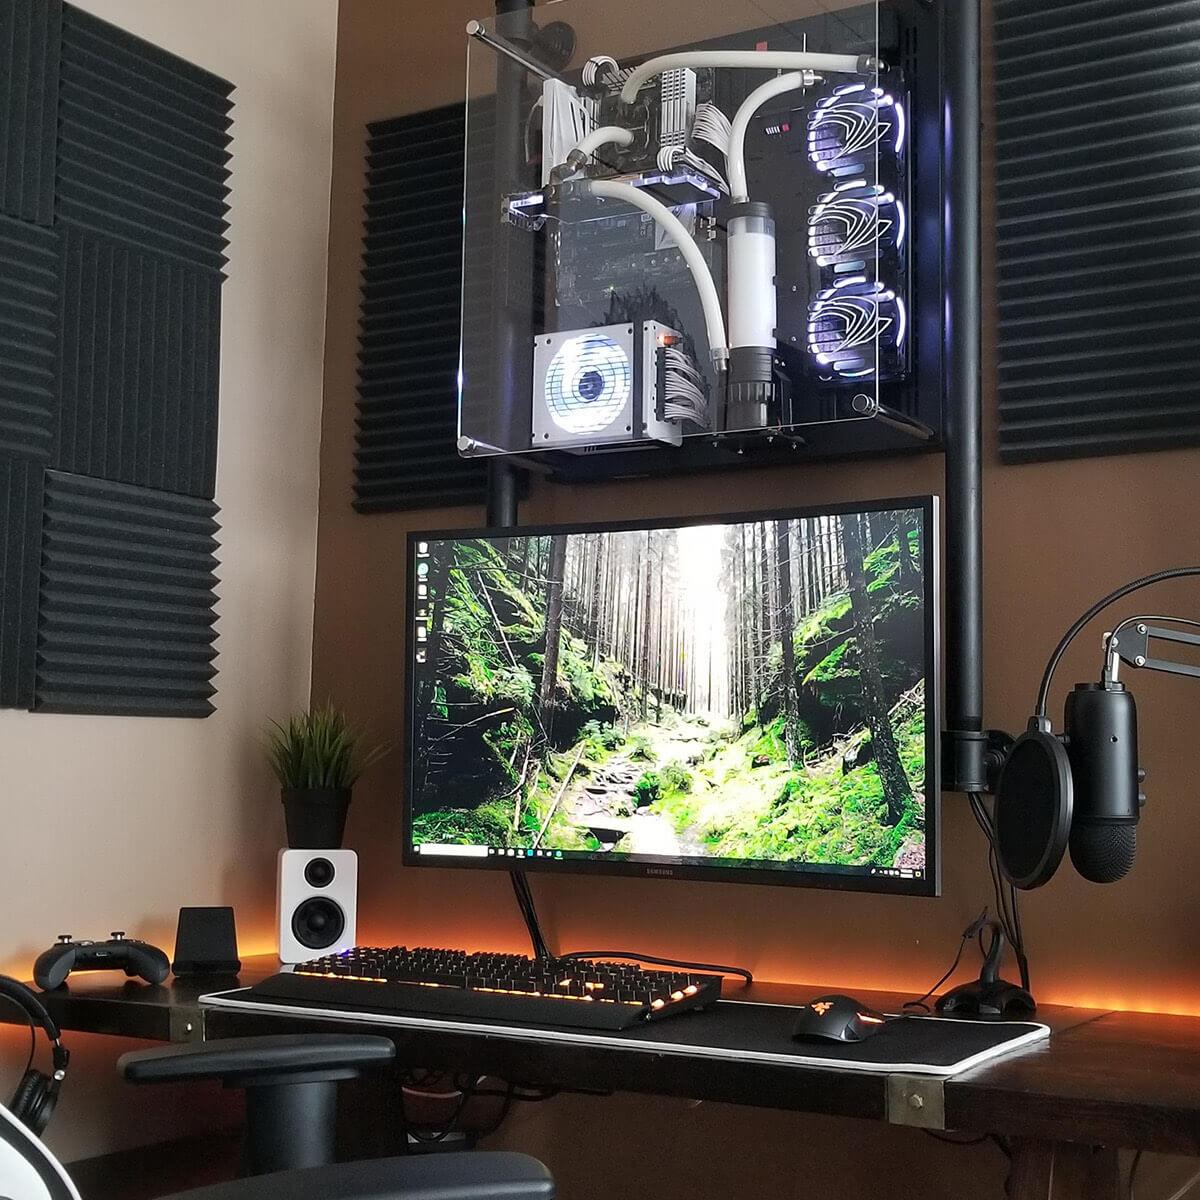 Wall Mounted PC Gaming Setup